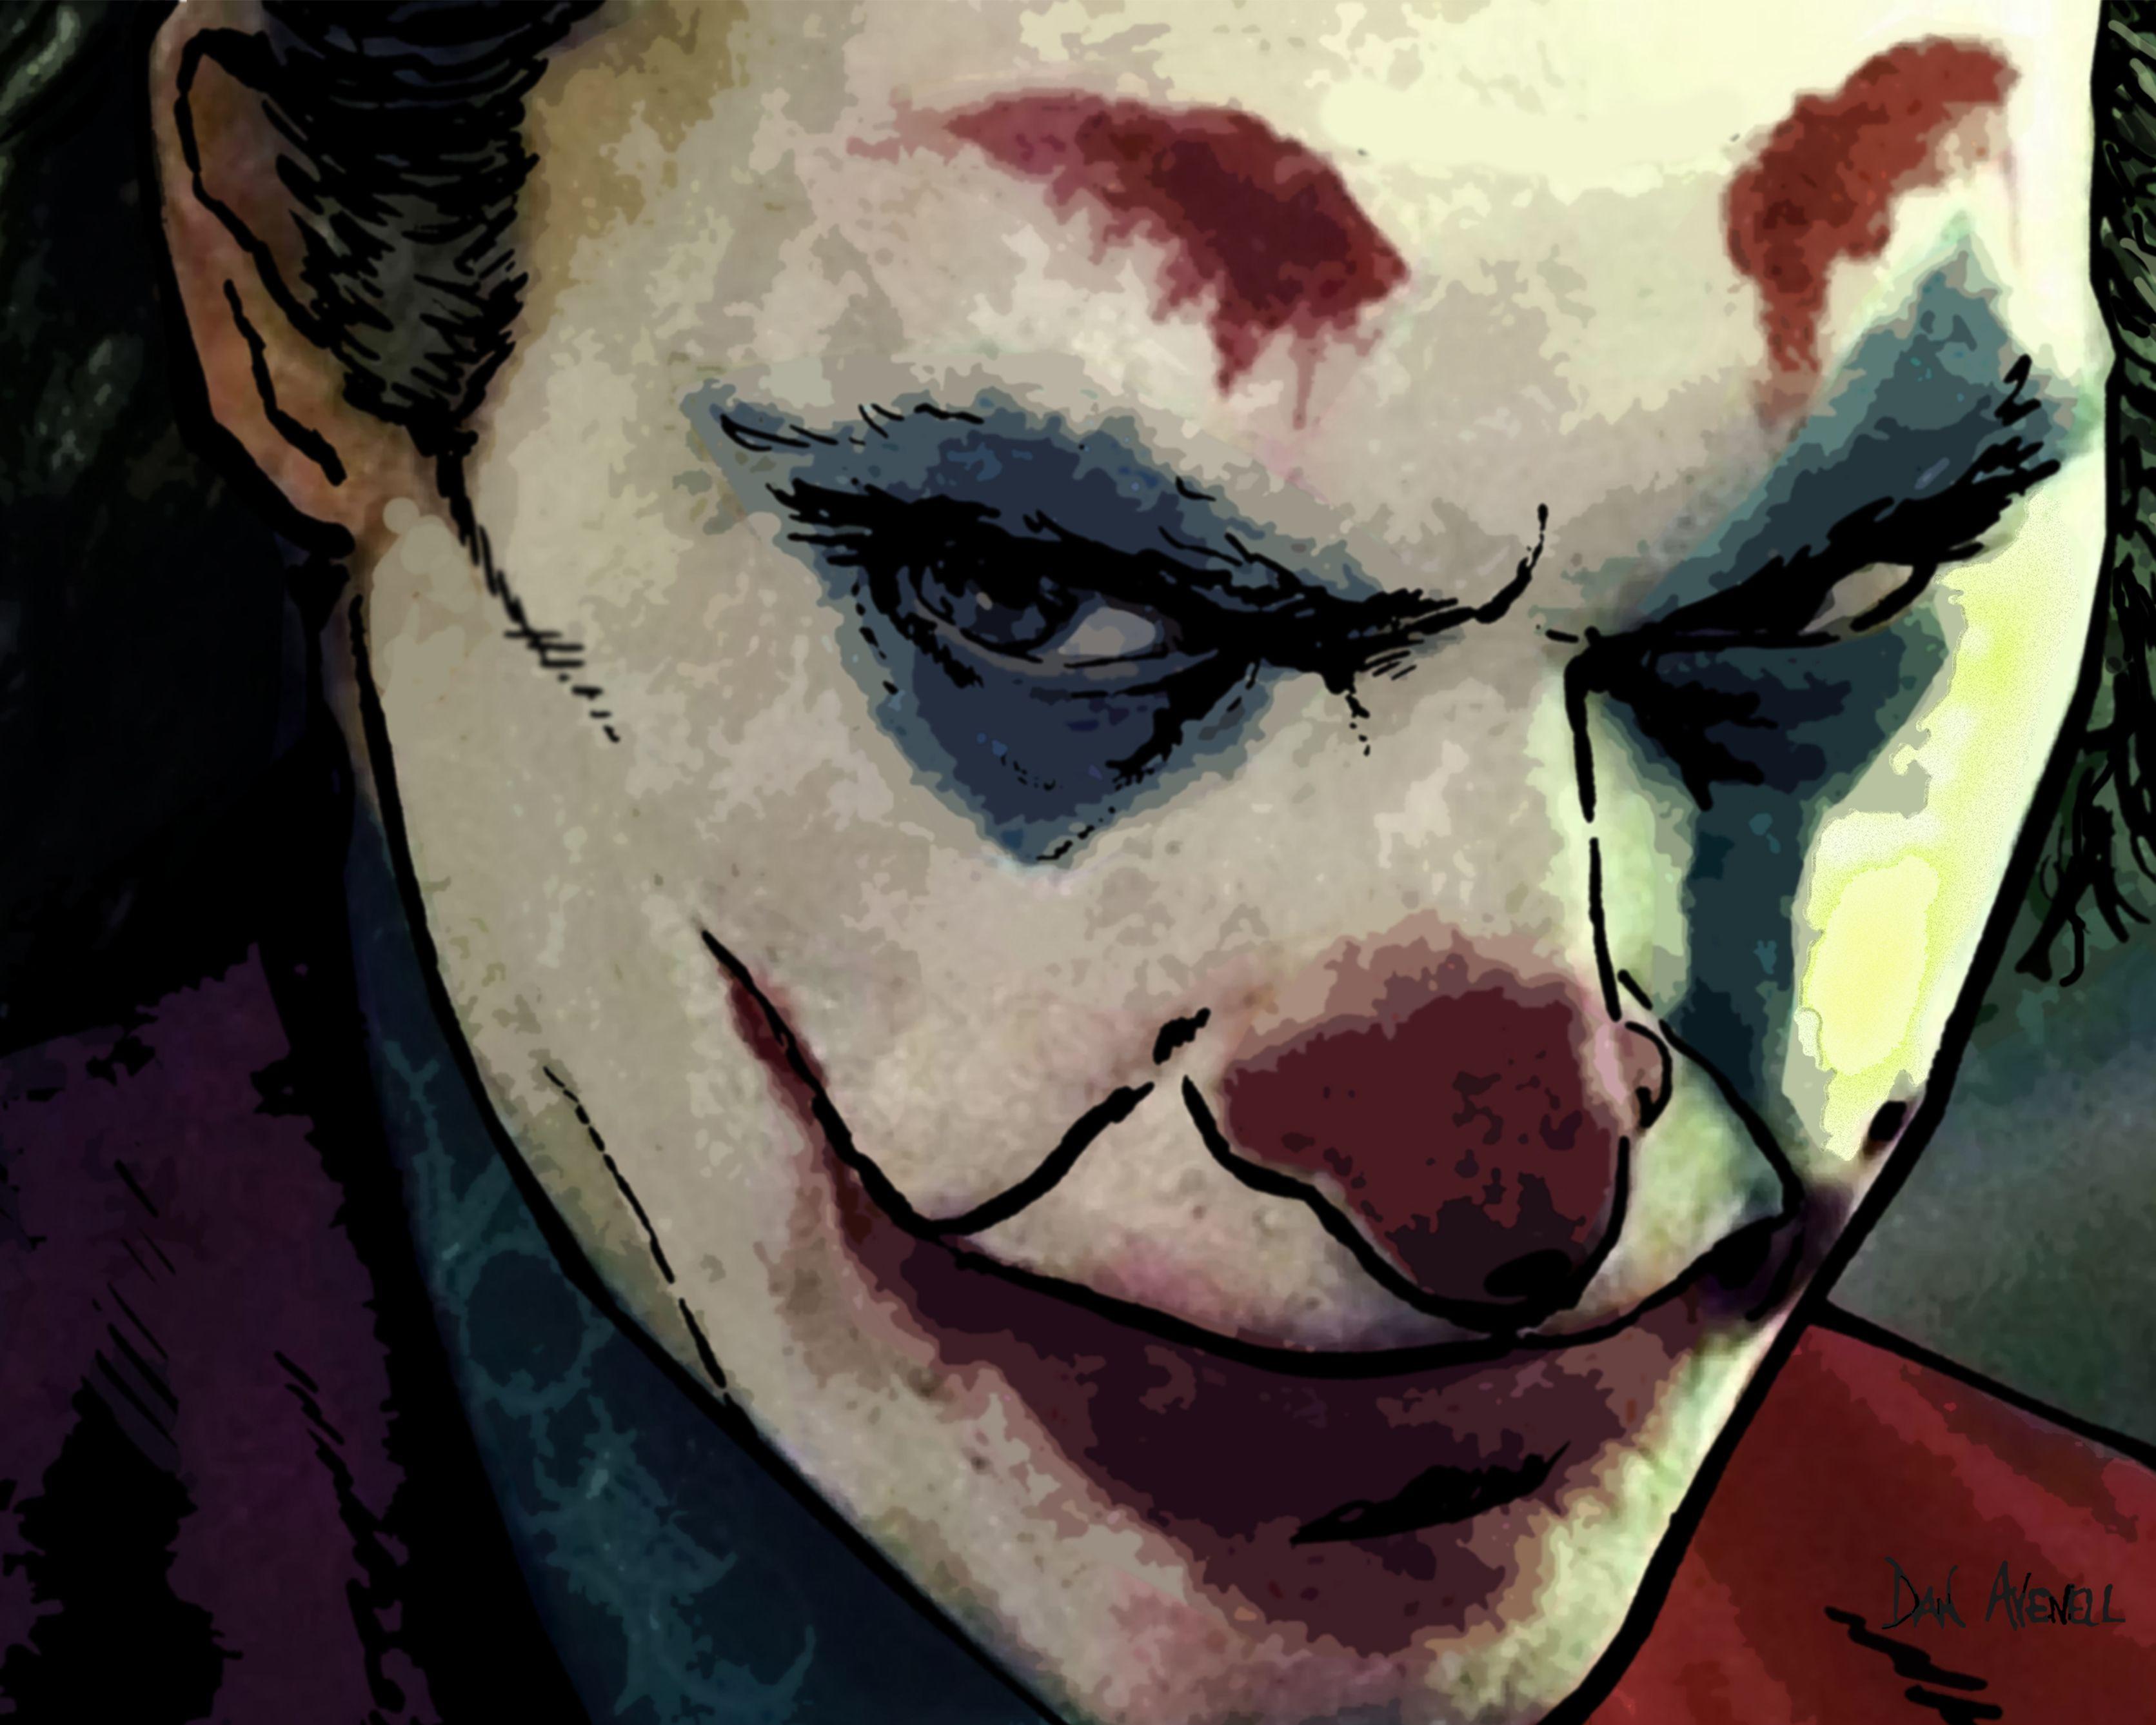 Pin By The Art Of Dan Avenell On Superhero City In 2020 Joker Art Art Marvel Wall Art